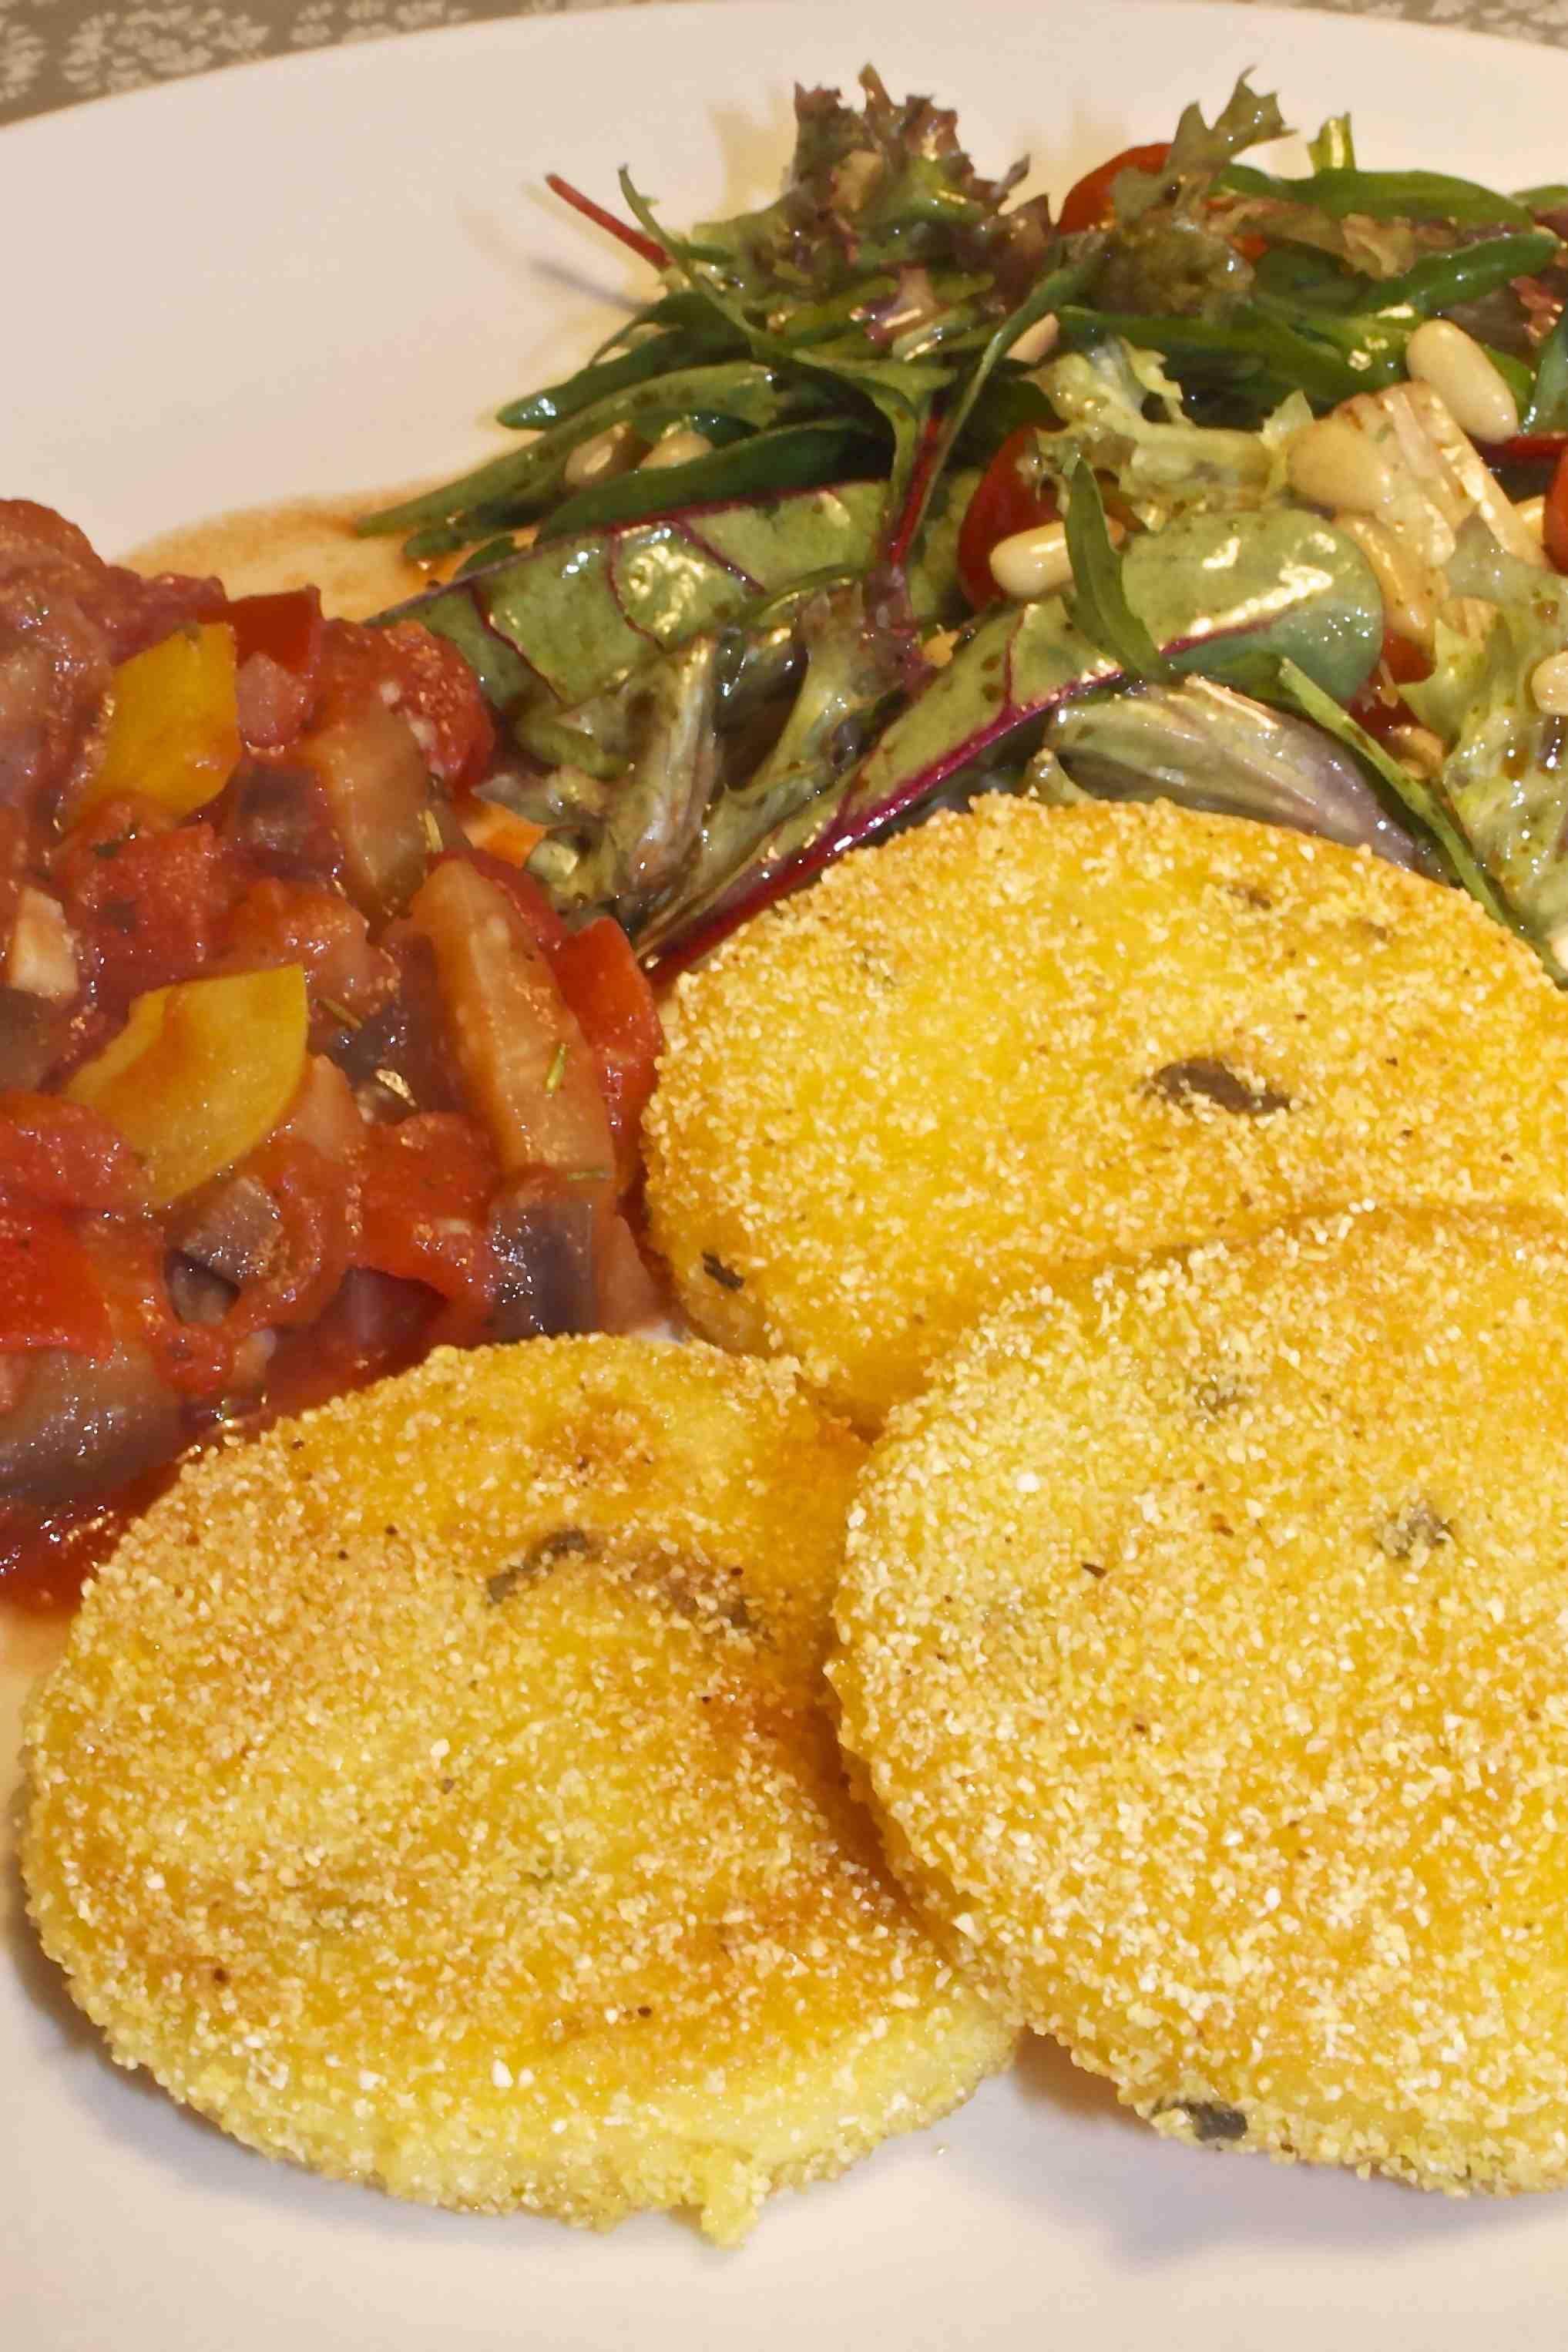 Polentakoekjes met aubergine-tomatensaus